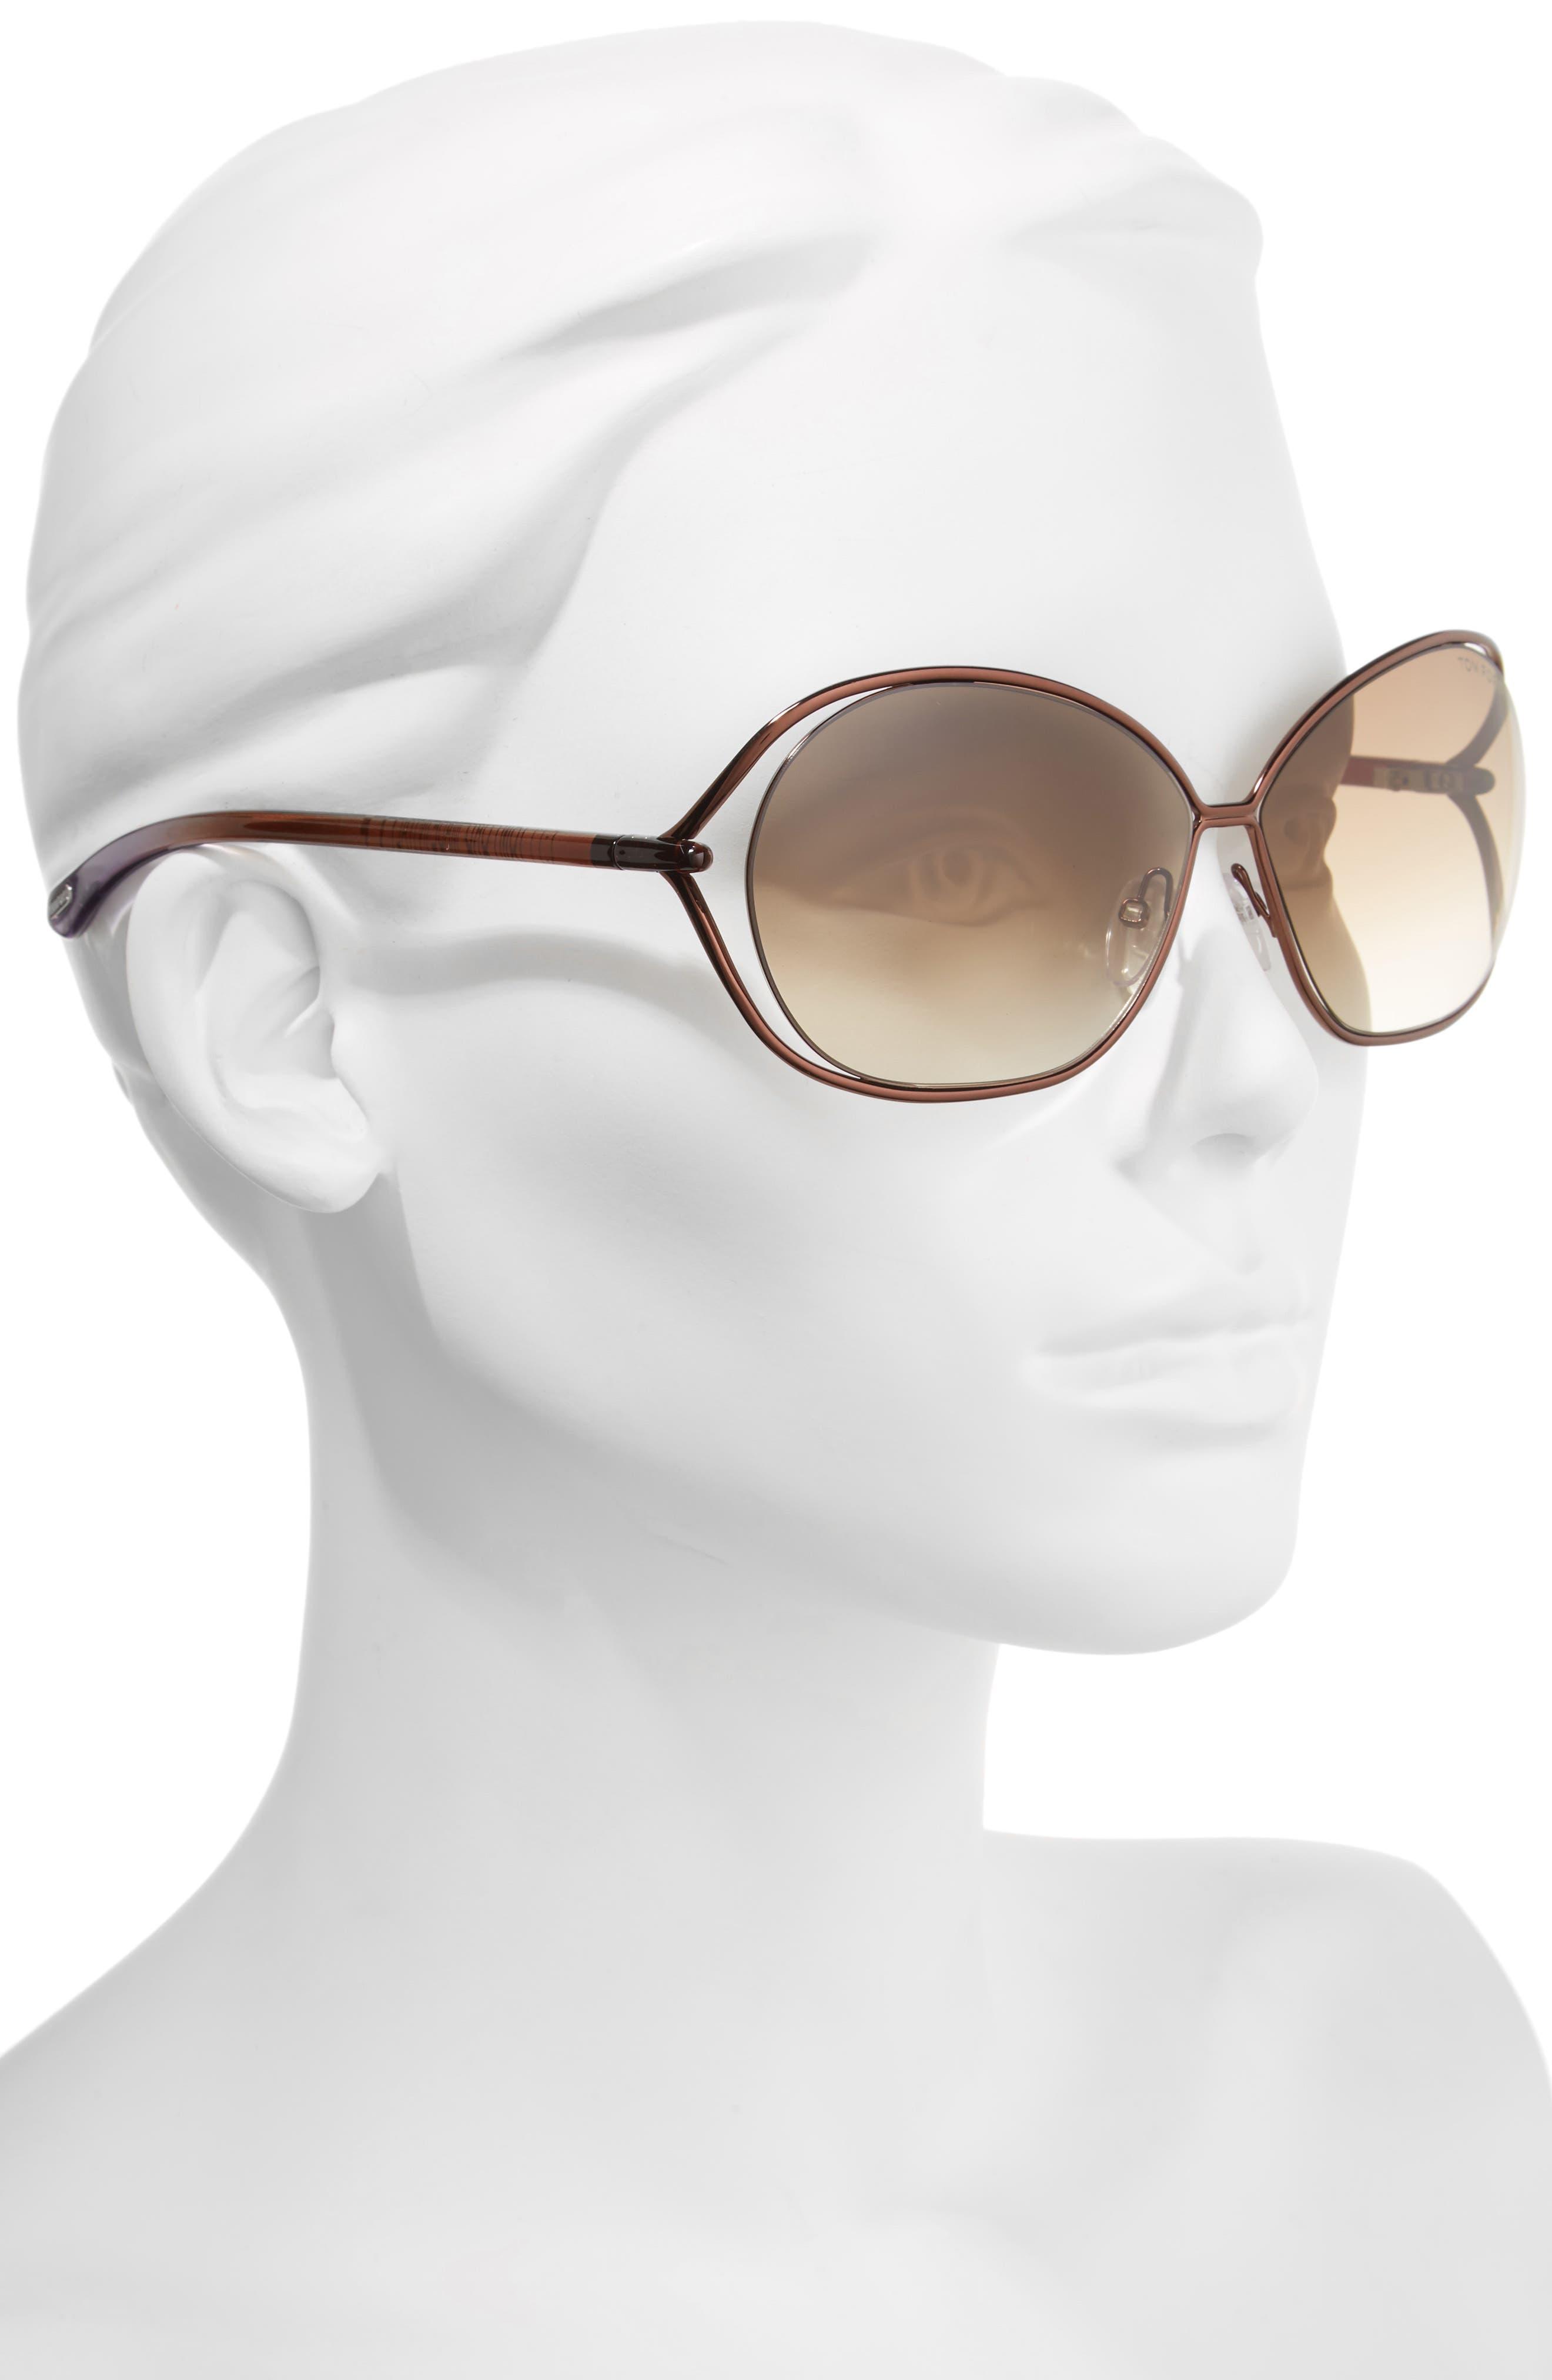 Alternate Image 2  - Tom Ford 'Carla' 66mm Oversized Round Metal Sunglasses